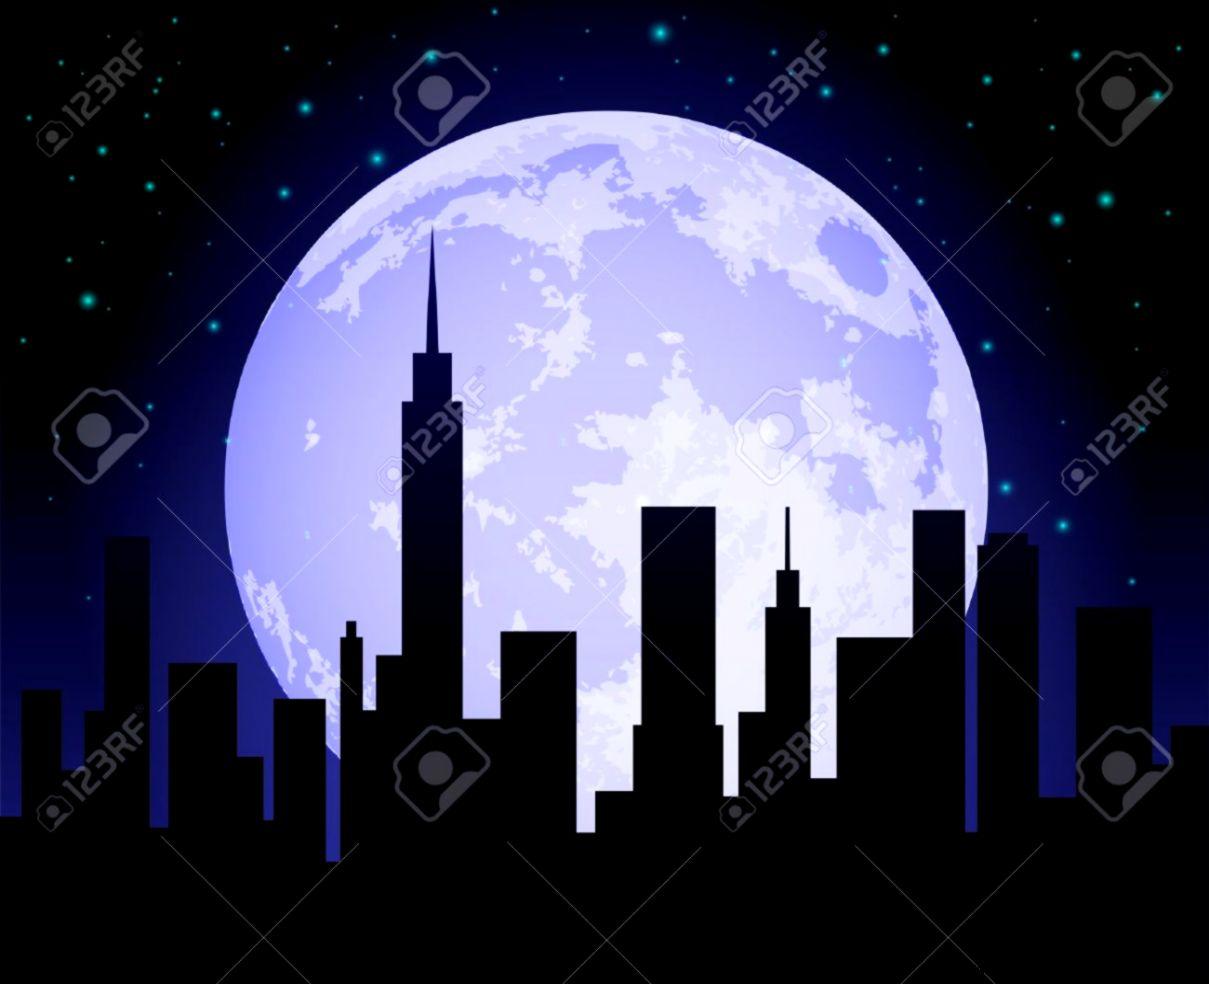 City Skylines At Night Painting 63286  DFILES